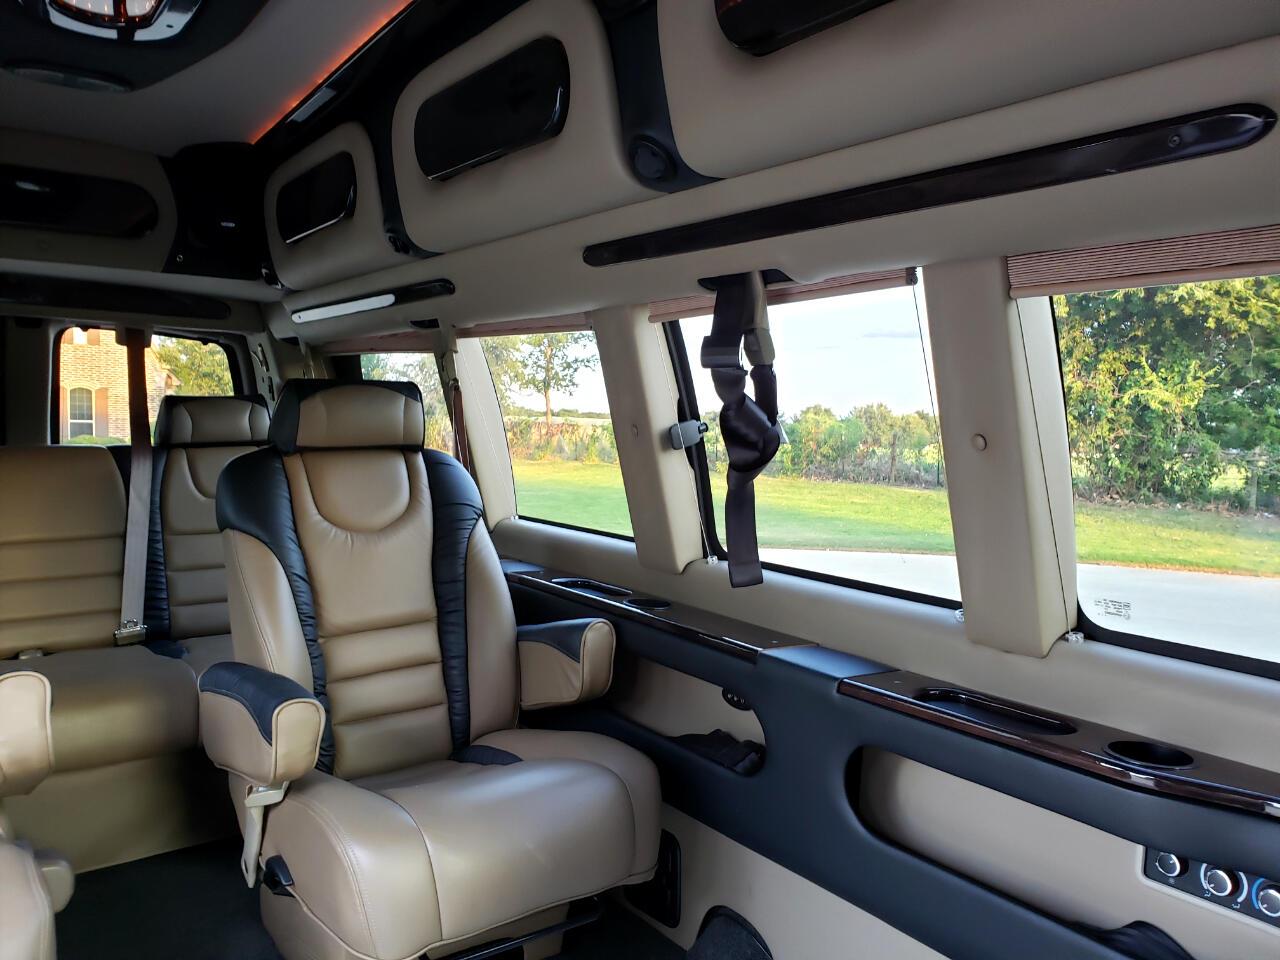 2014 GMC Savana RV G2500 3LT